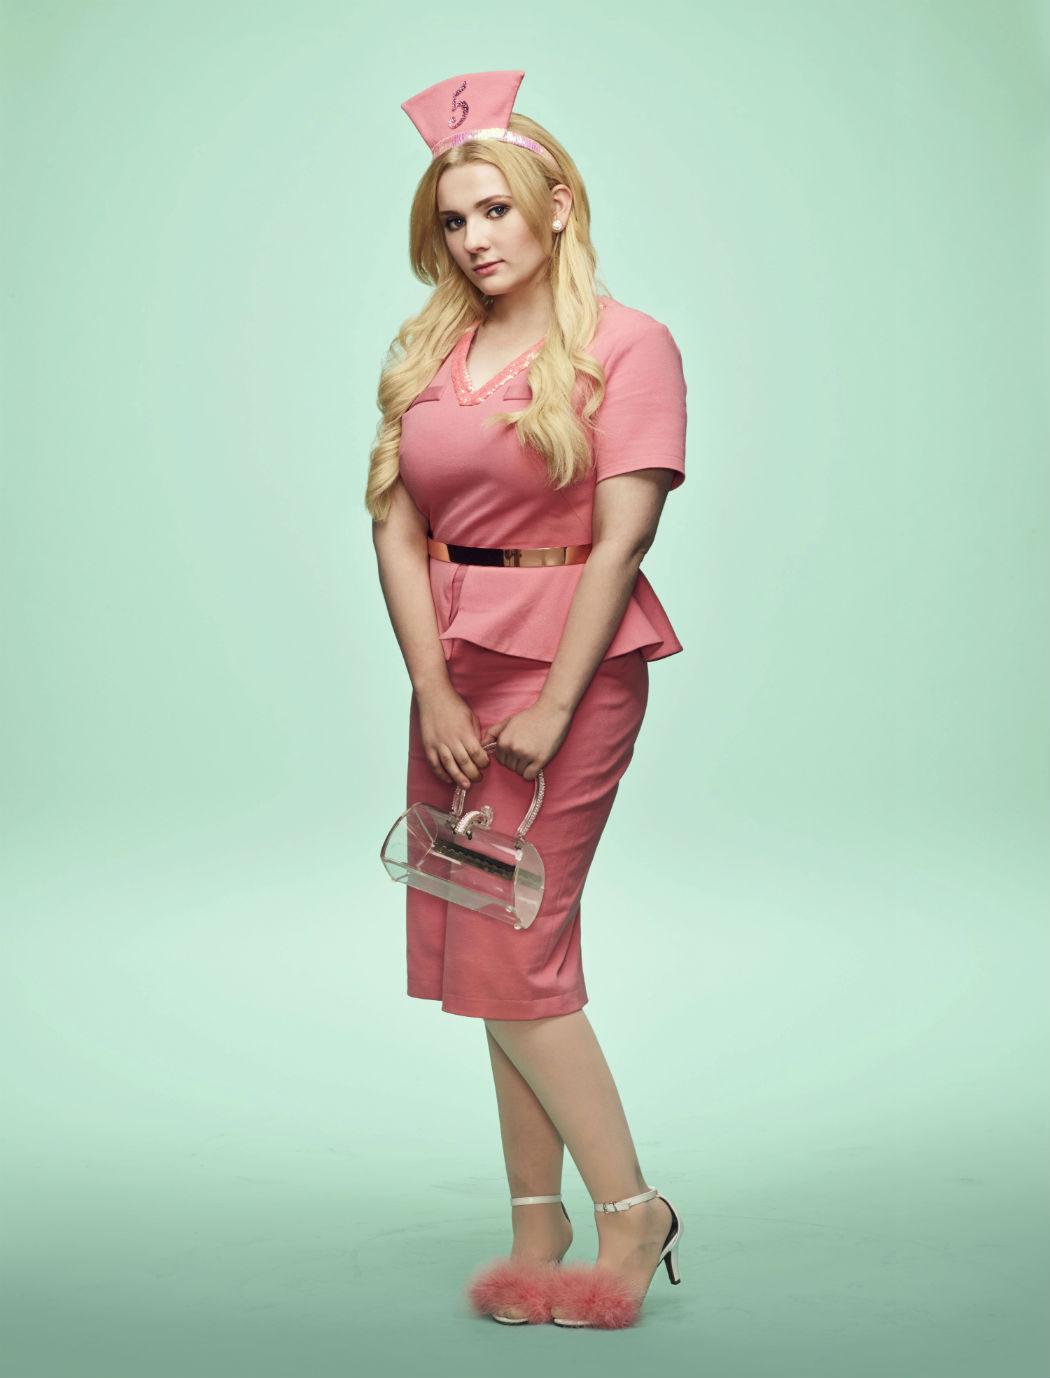 Abigail Breslin como Chanel #5